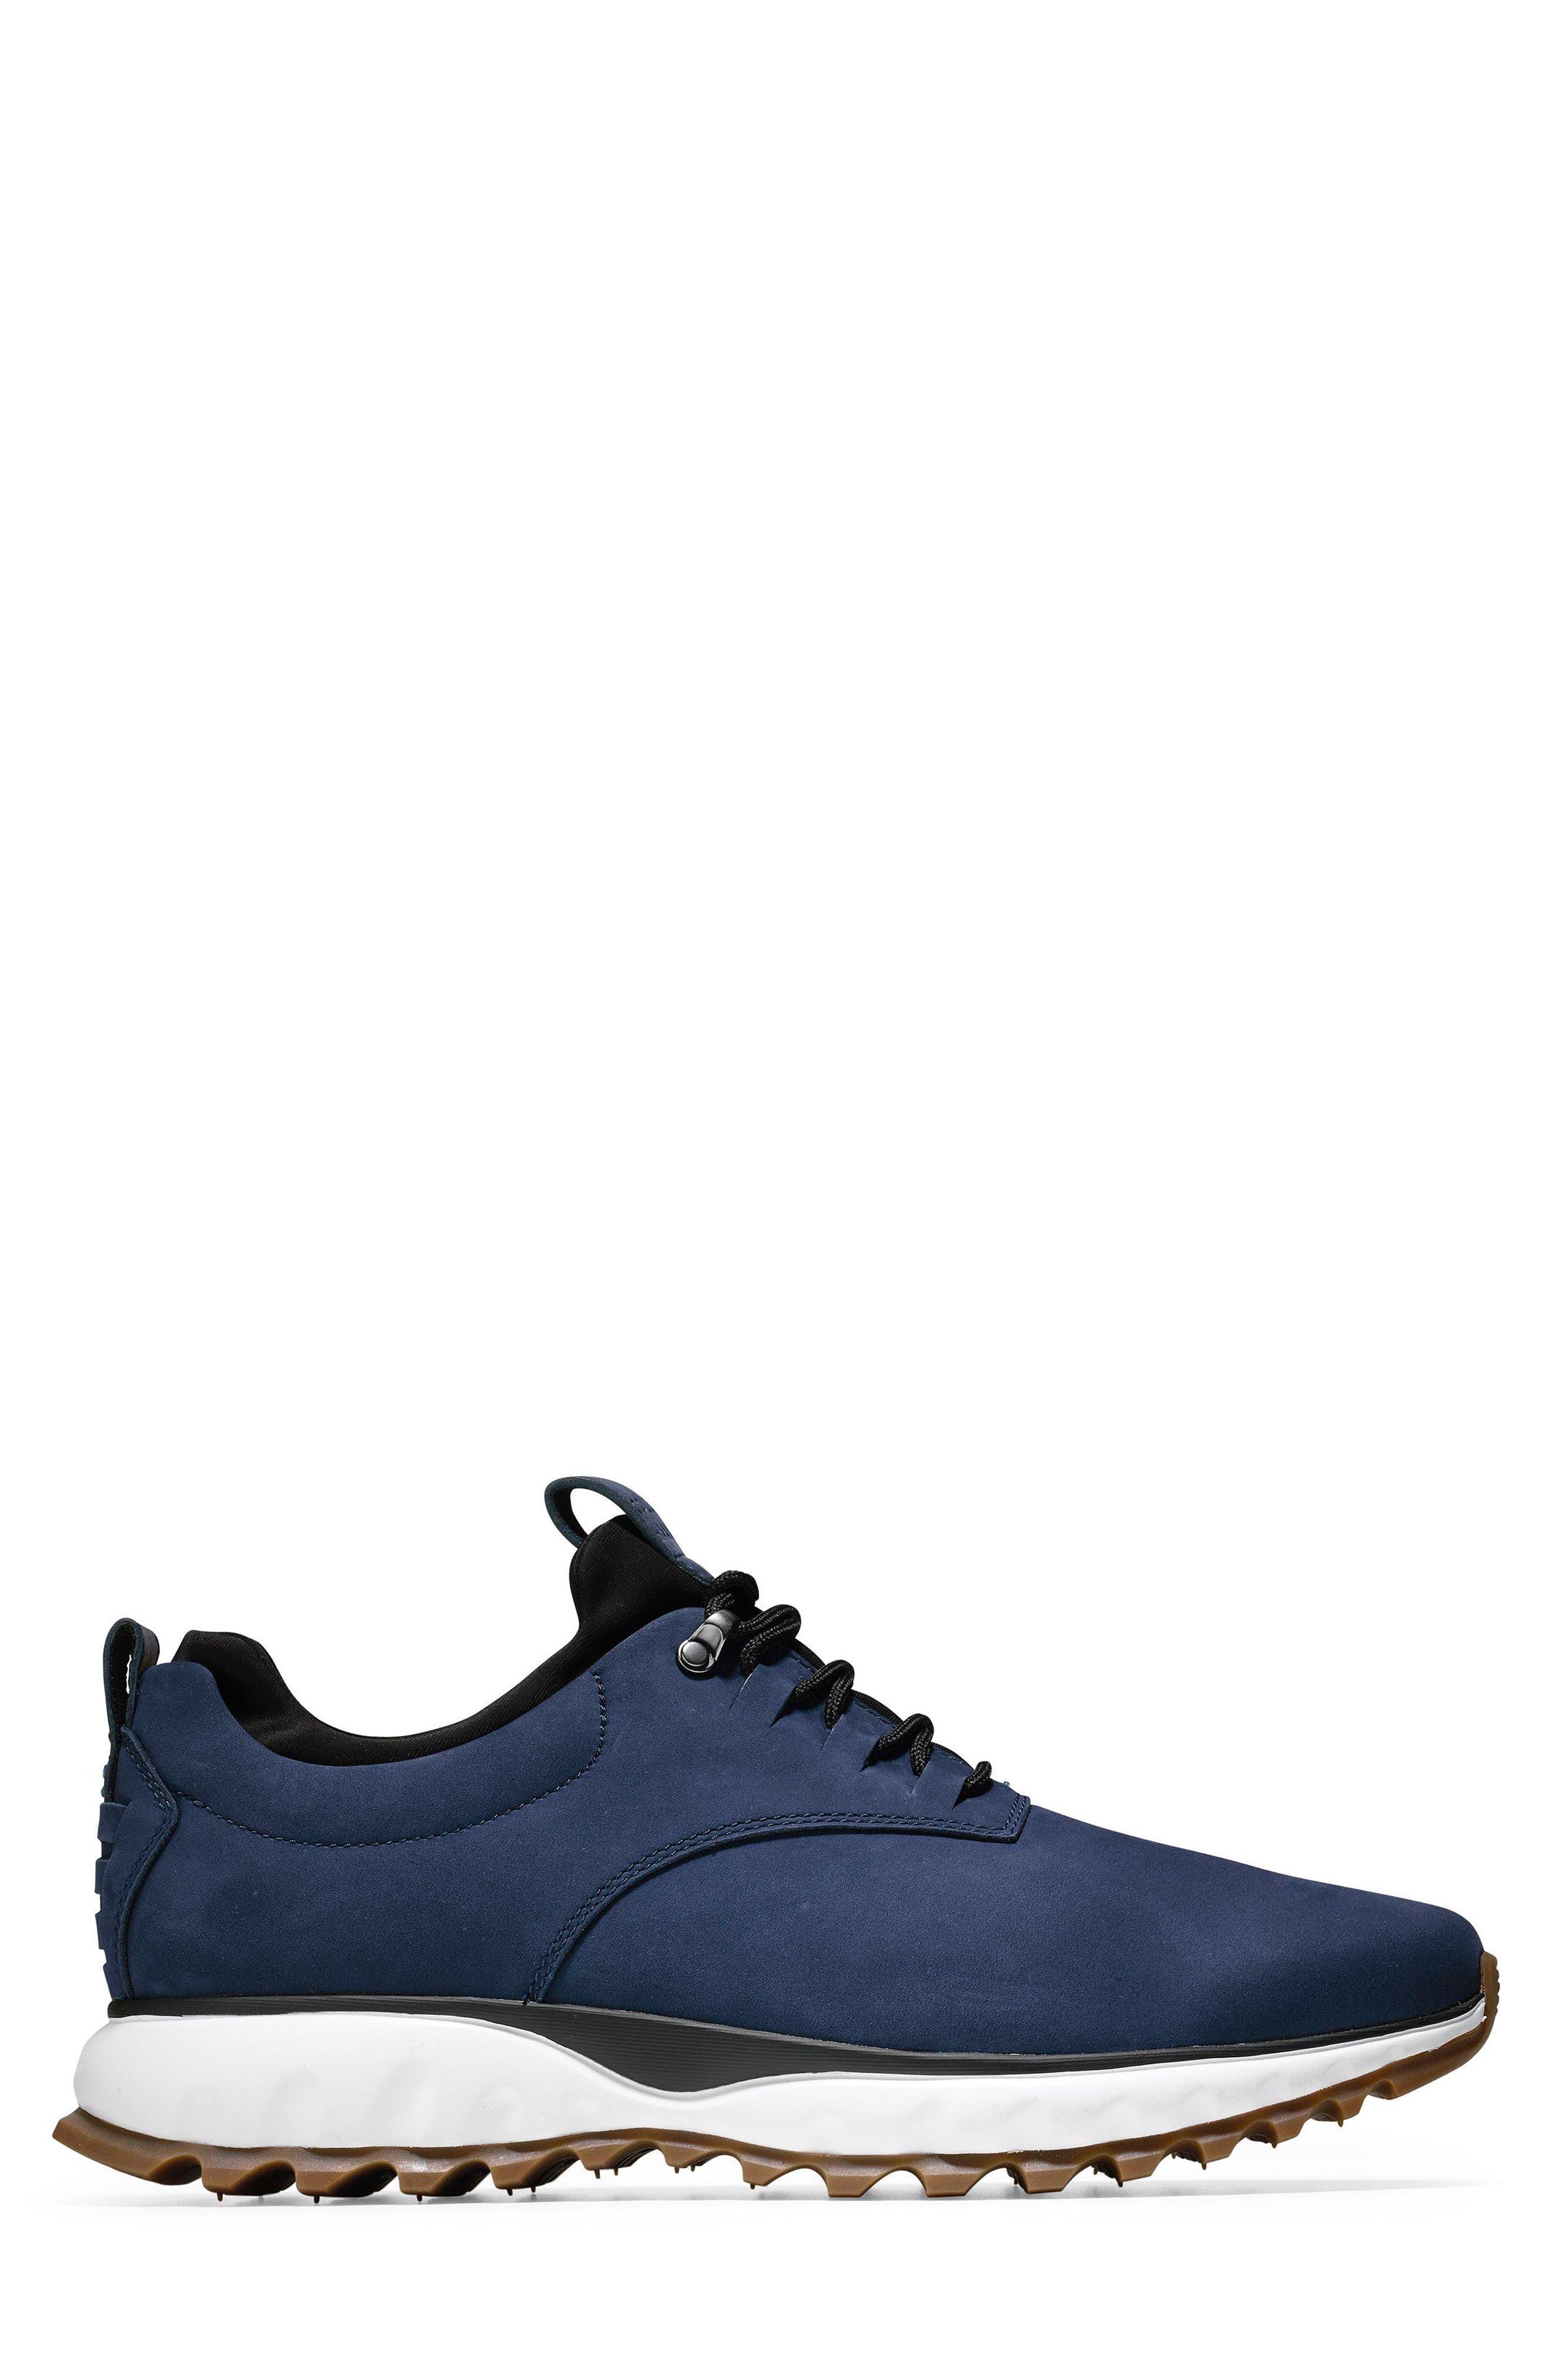 GrandExpløre All Terrain Waterproof Sneaker,                             Alternate thumbnail 3, color,                             Marine Blue Nubuck